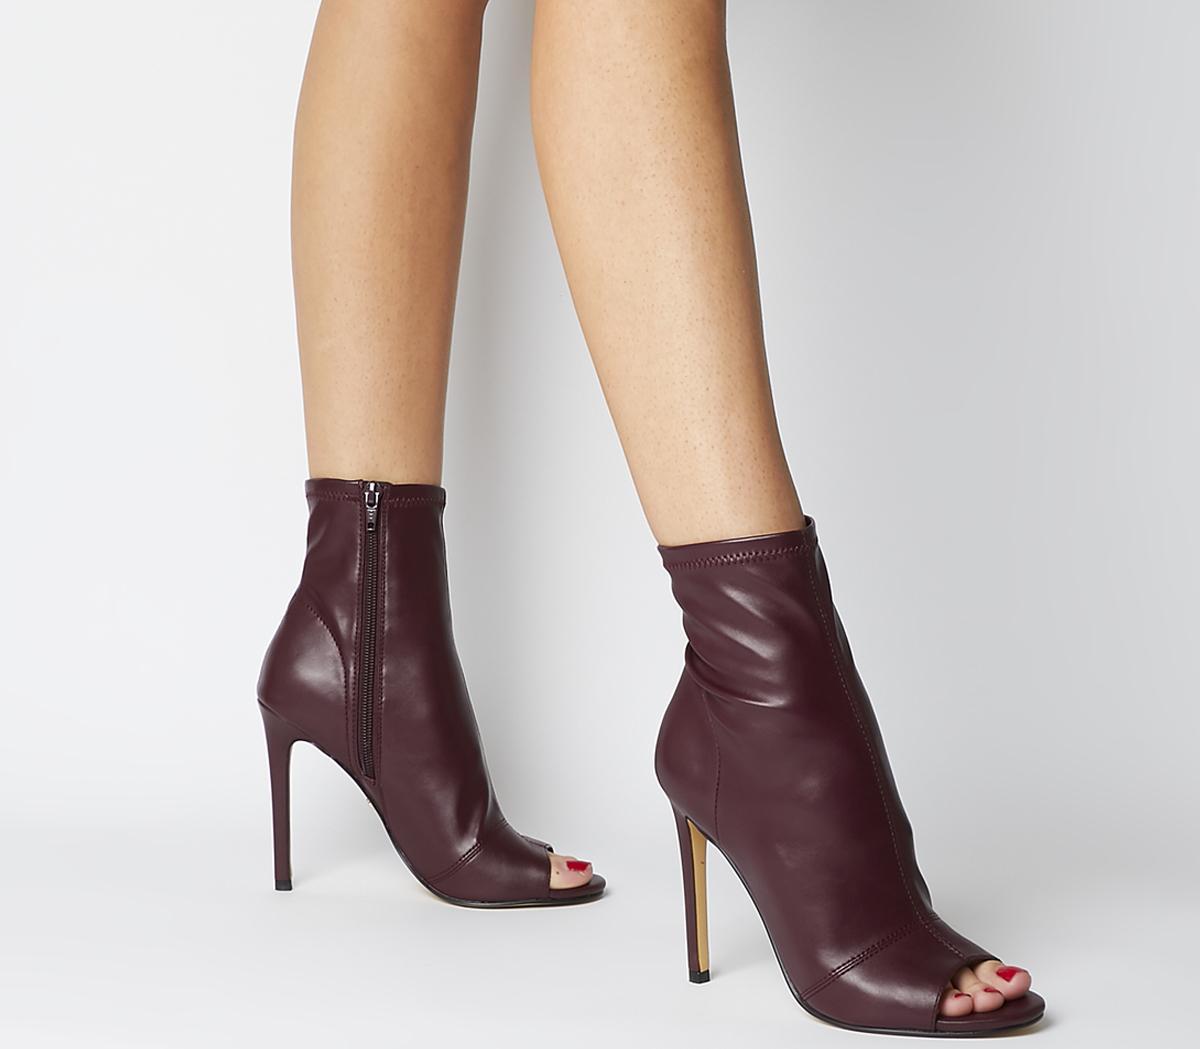 Office Aware Dressy Peep Toe Boots